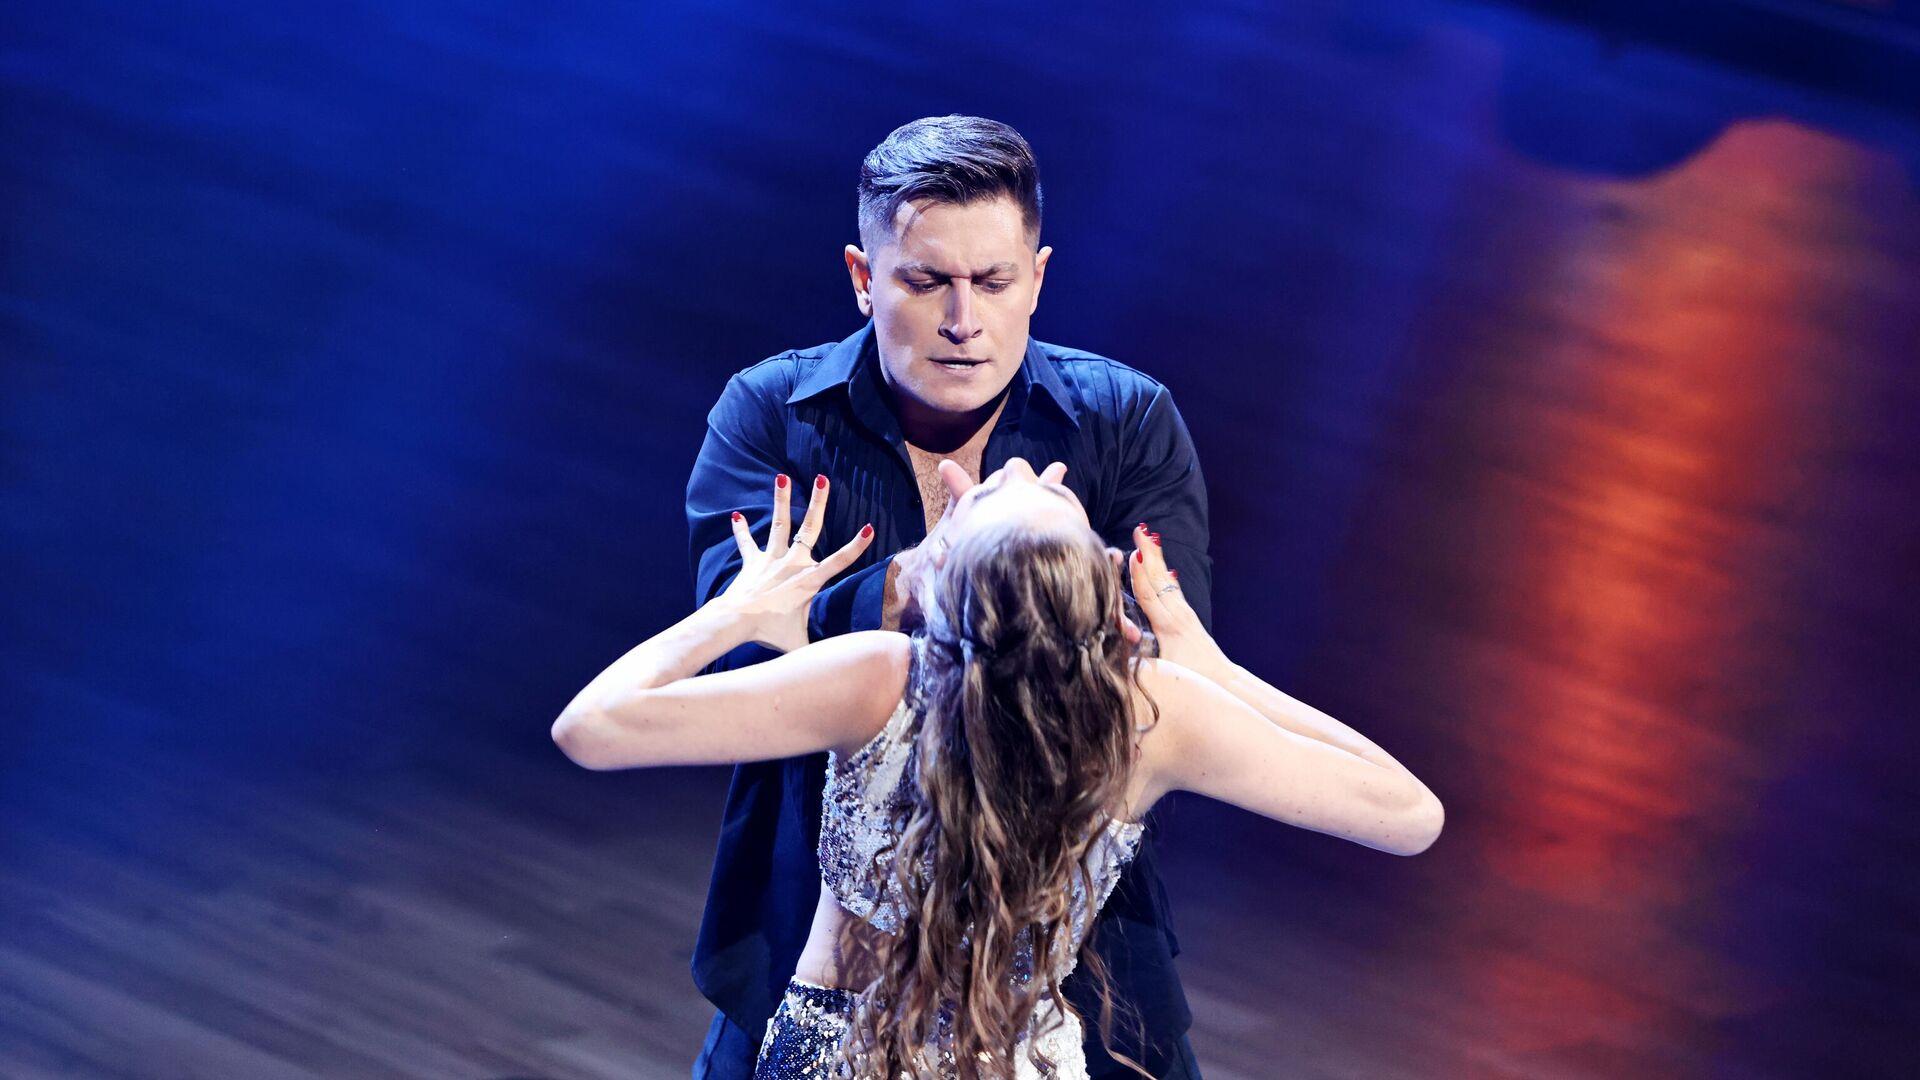 Блогер Давид Манукян (Dava) и Дарья Палей на шоу Танцы со звездами - РИА Новости, 1920, 22.02.2021